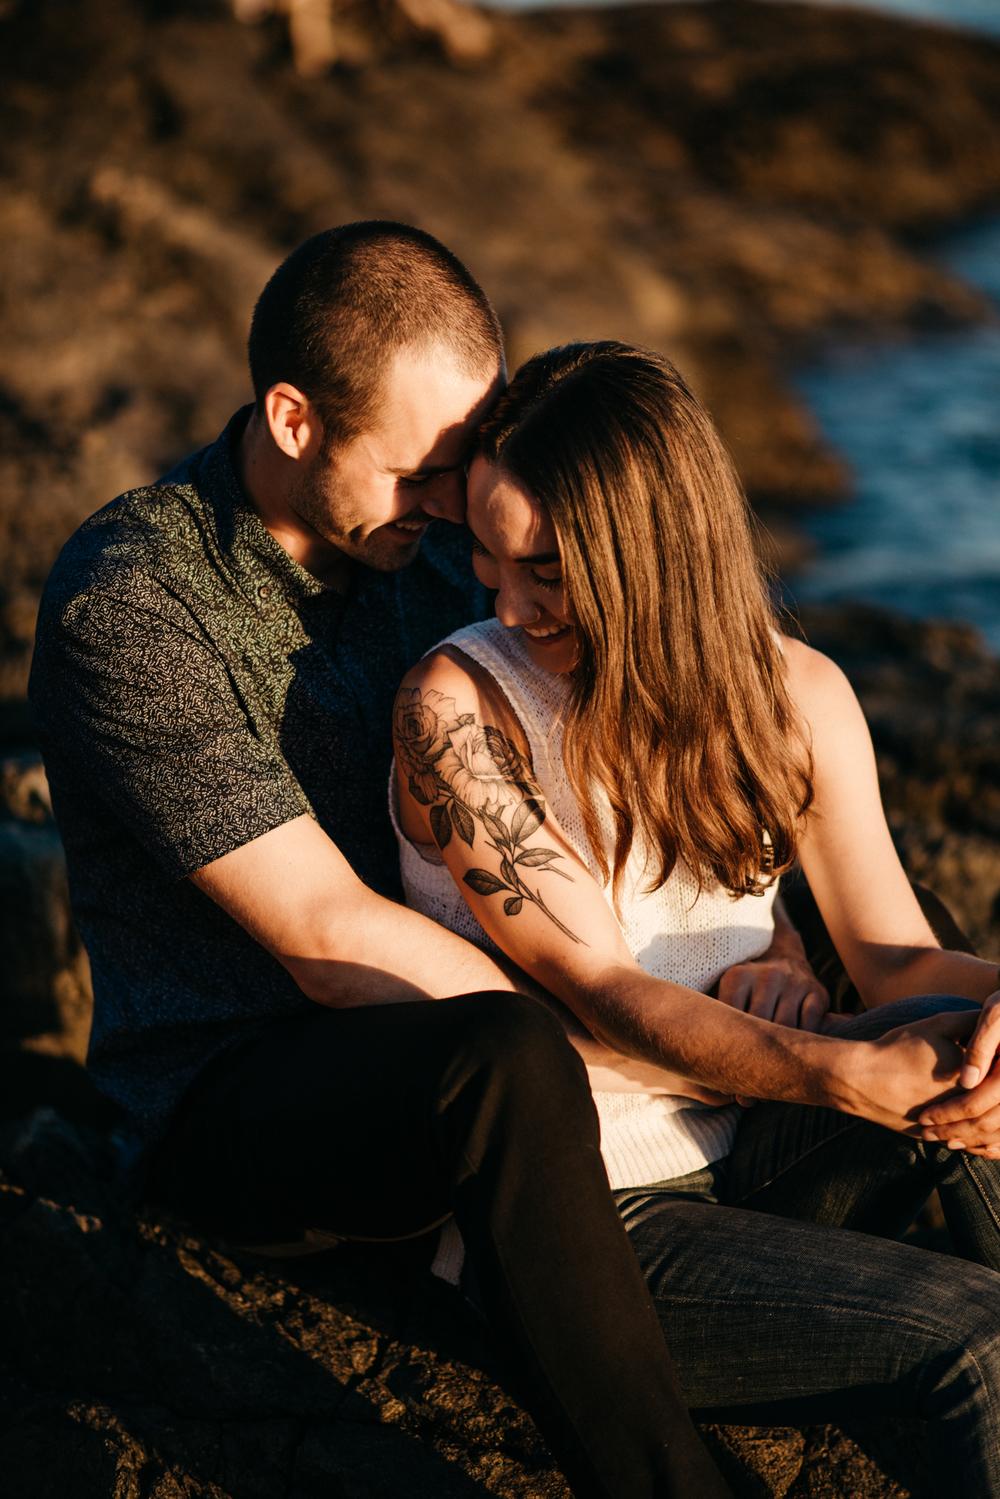 014_DallasRoad_Victoria_Engagement.jpg